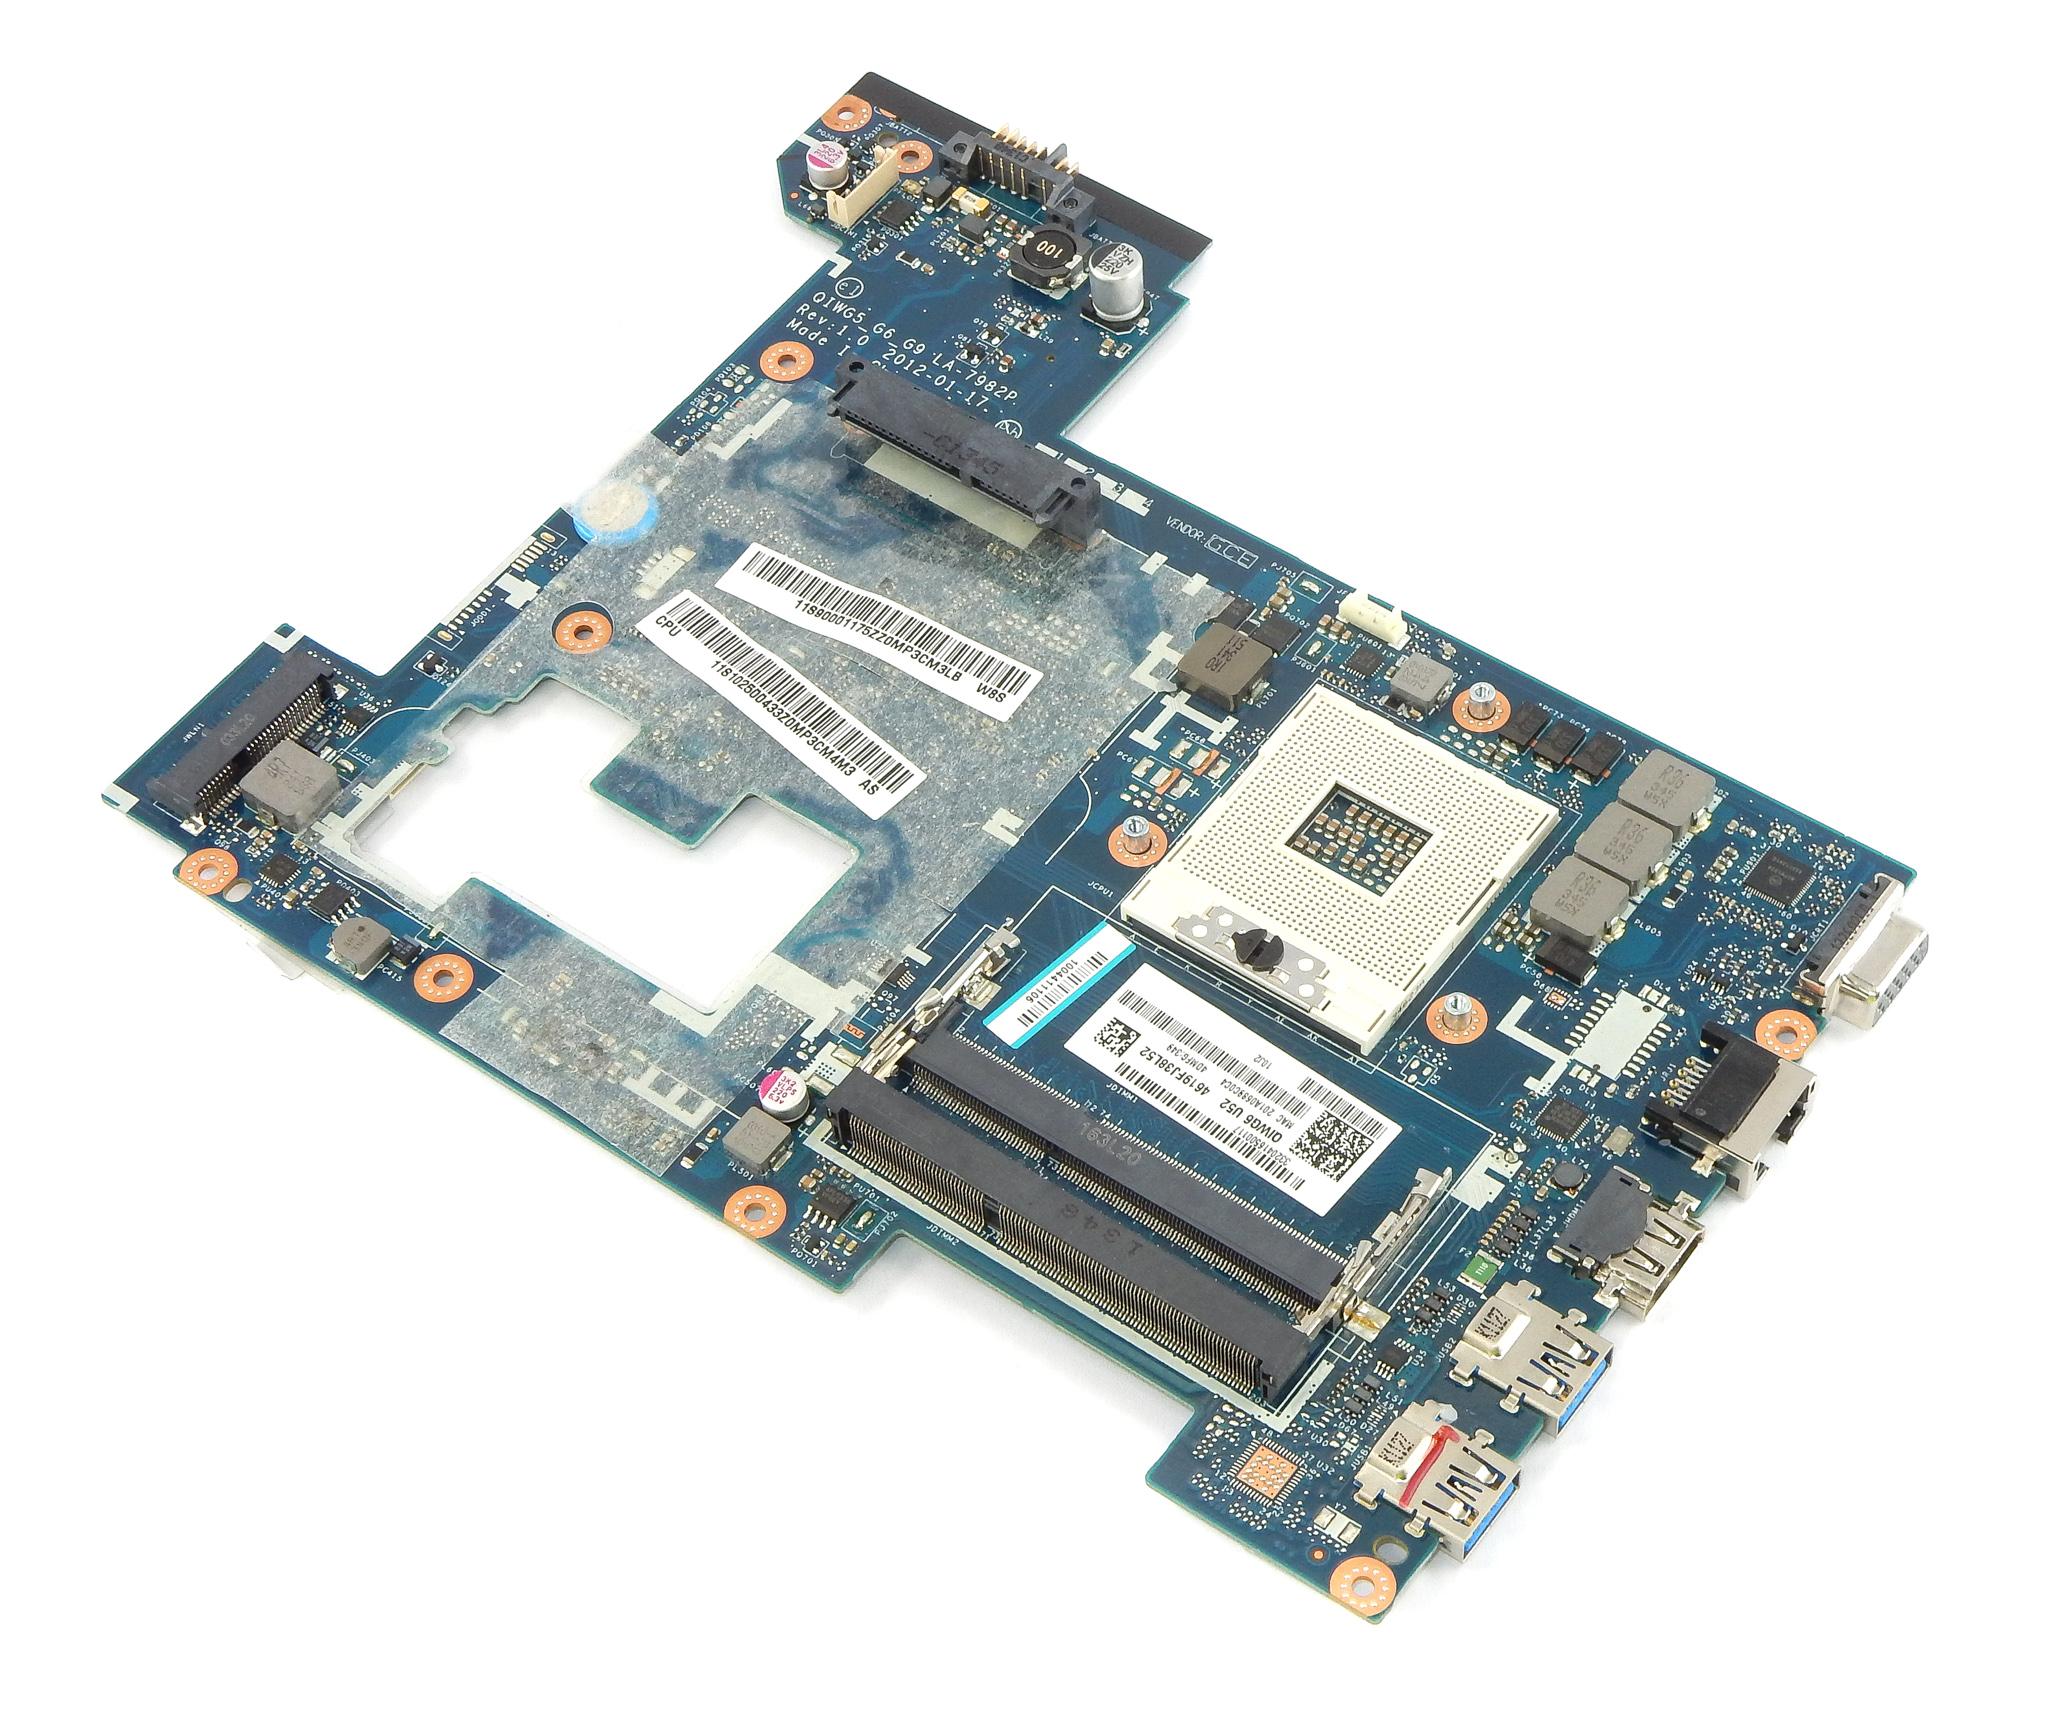 Lenovo 11S90001175 Ideapad G580 Laptop Motherboard QIWG5_G6_G9 LA-7982P